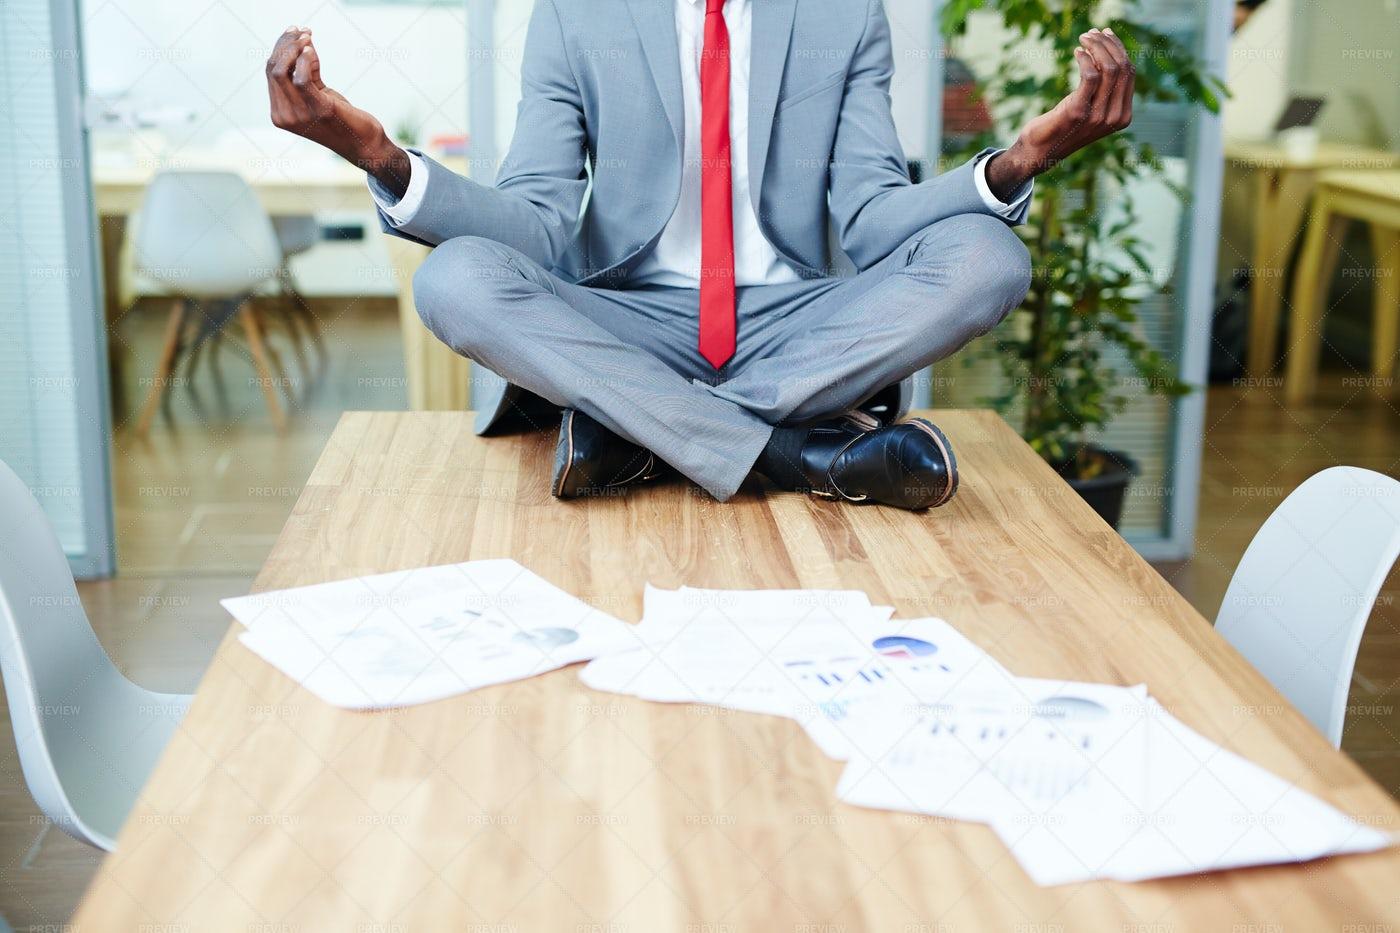 Spiritual Relax: Stock Photos